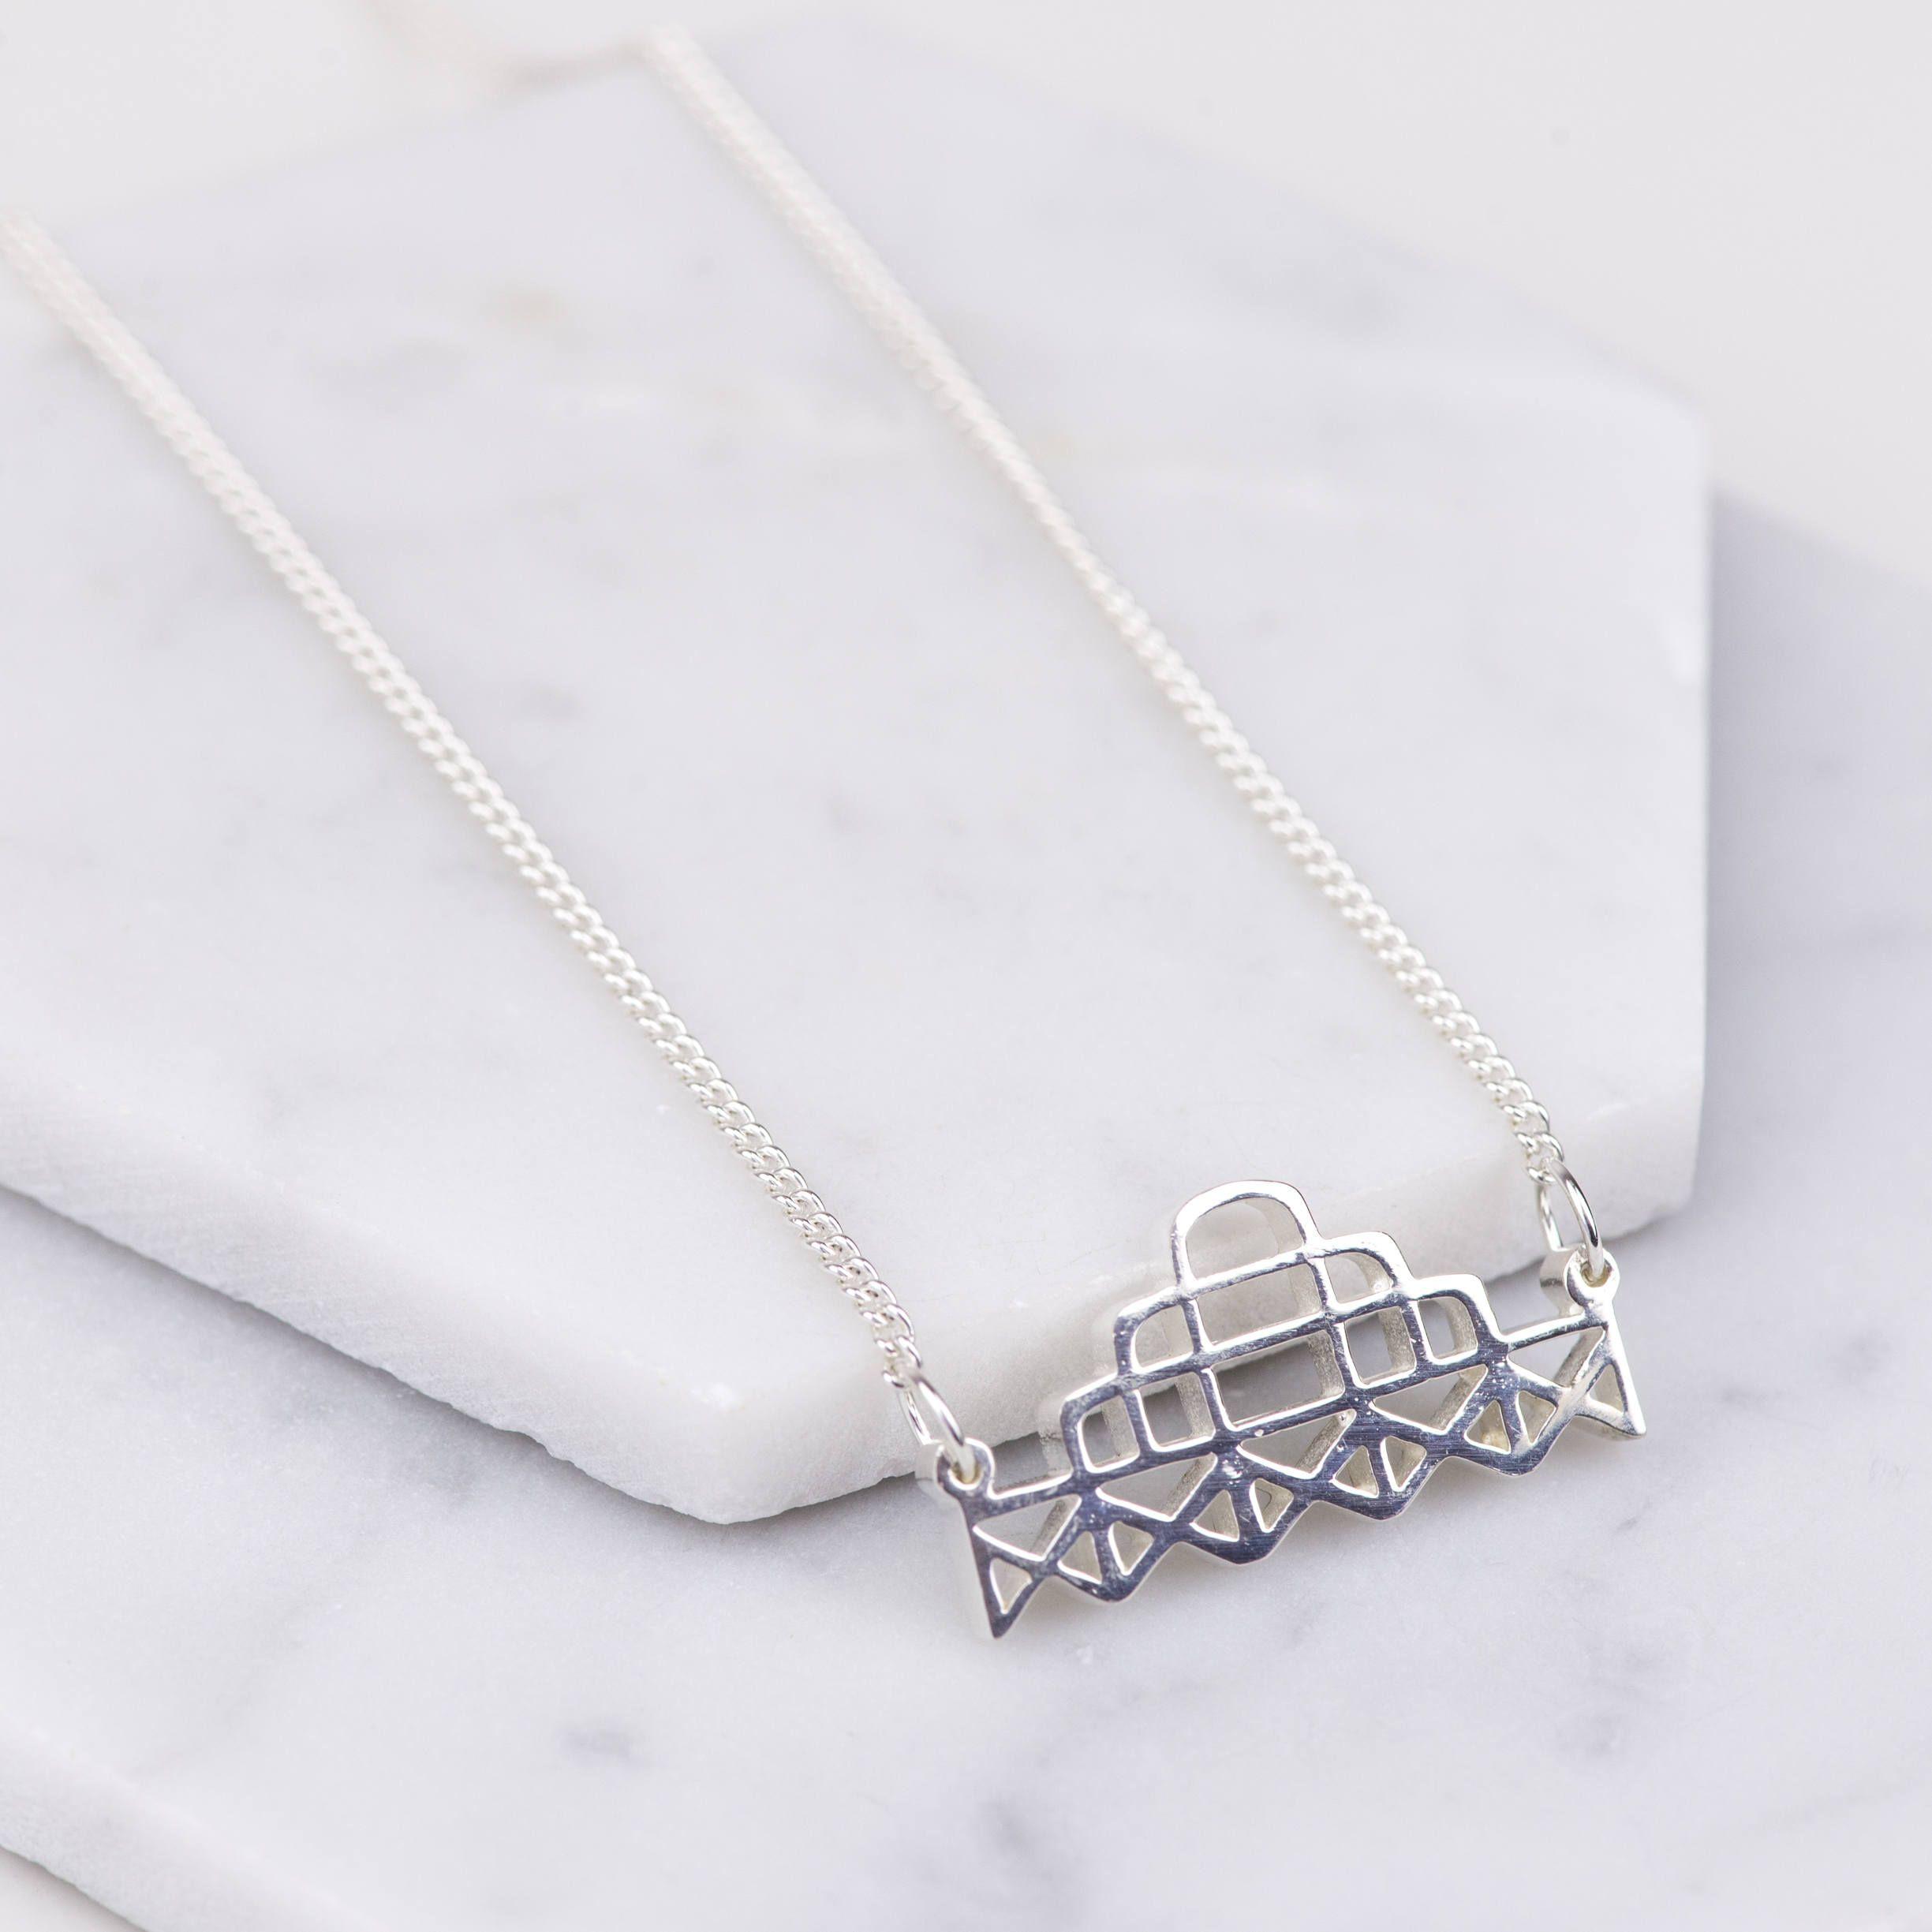 Brighton West Pier Necklace Sterling Silver Minimalist Geometric Jewellery Art Deco Seaside Necklace In 2020 Silver Geometric Jewelry Sterling Silver Necklaces